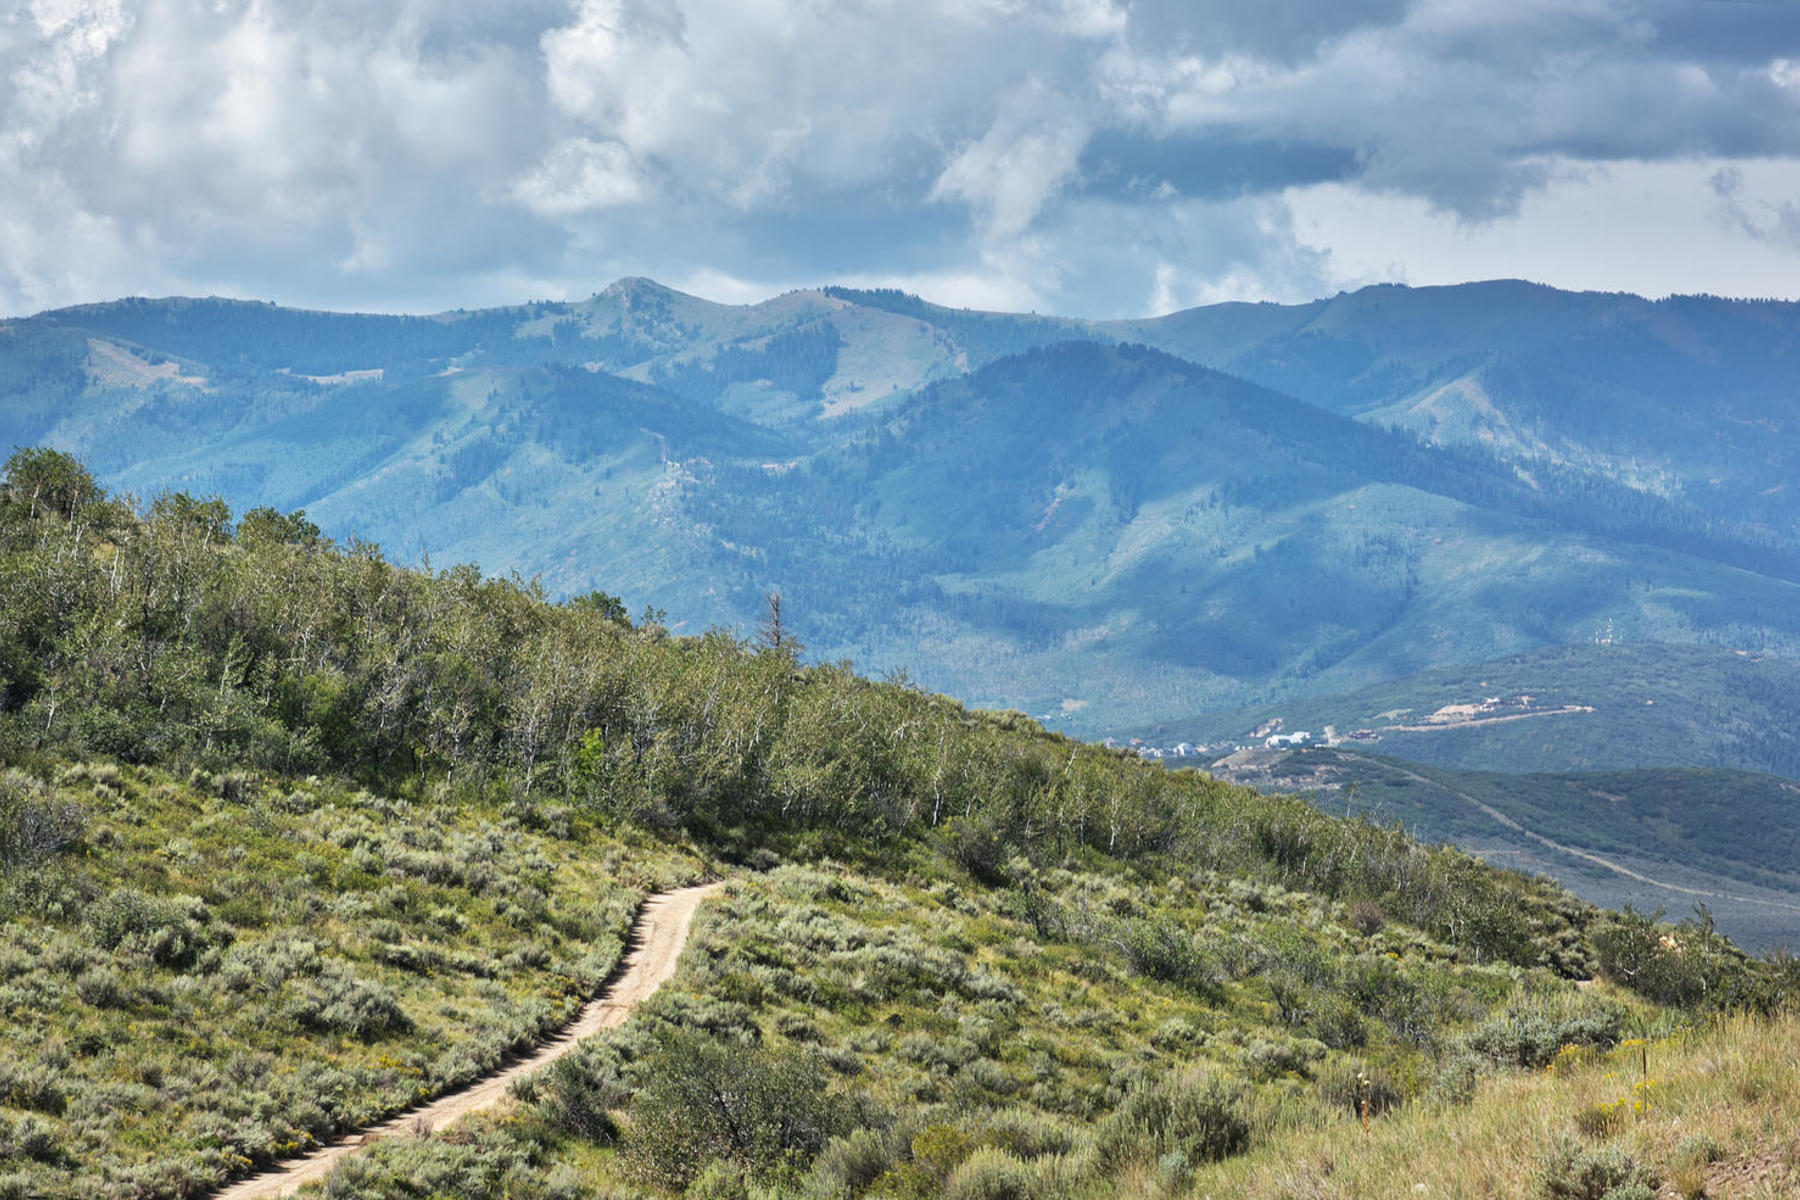 Terrain pour l Vente à Homesite in Promontory Located Less Than 1/2 Mile From The Ranch Club Compound 7780 N Promontory Ranch Rd Lot 31 Park City, Utah, 84098 États-Unis